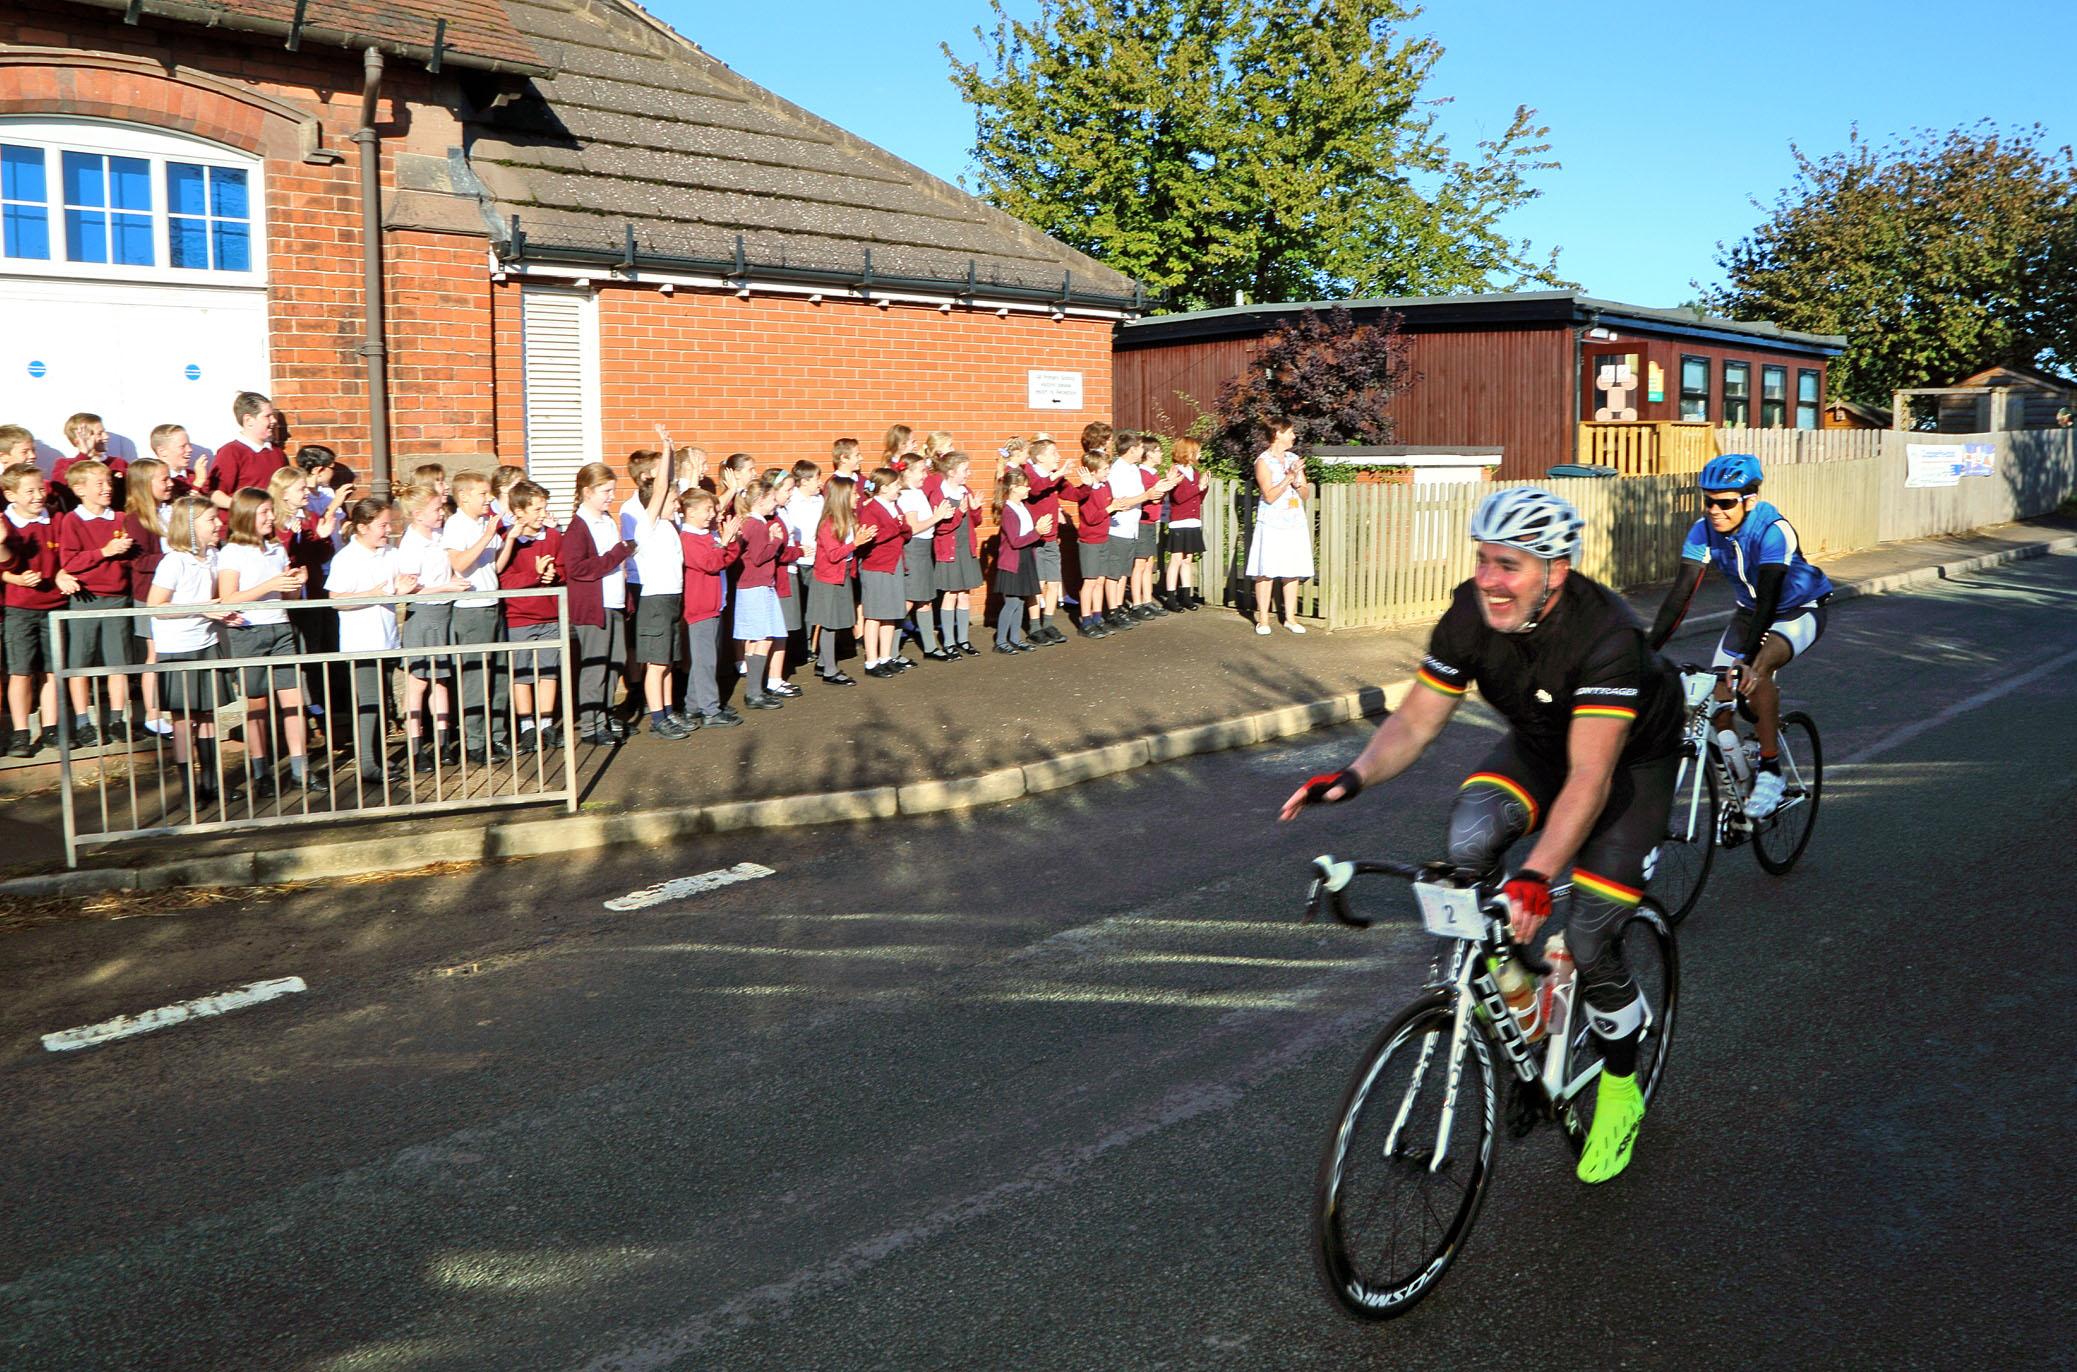 Primary schoolchildren from Condover School cheer cyclists en route